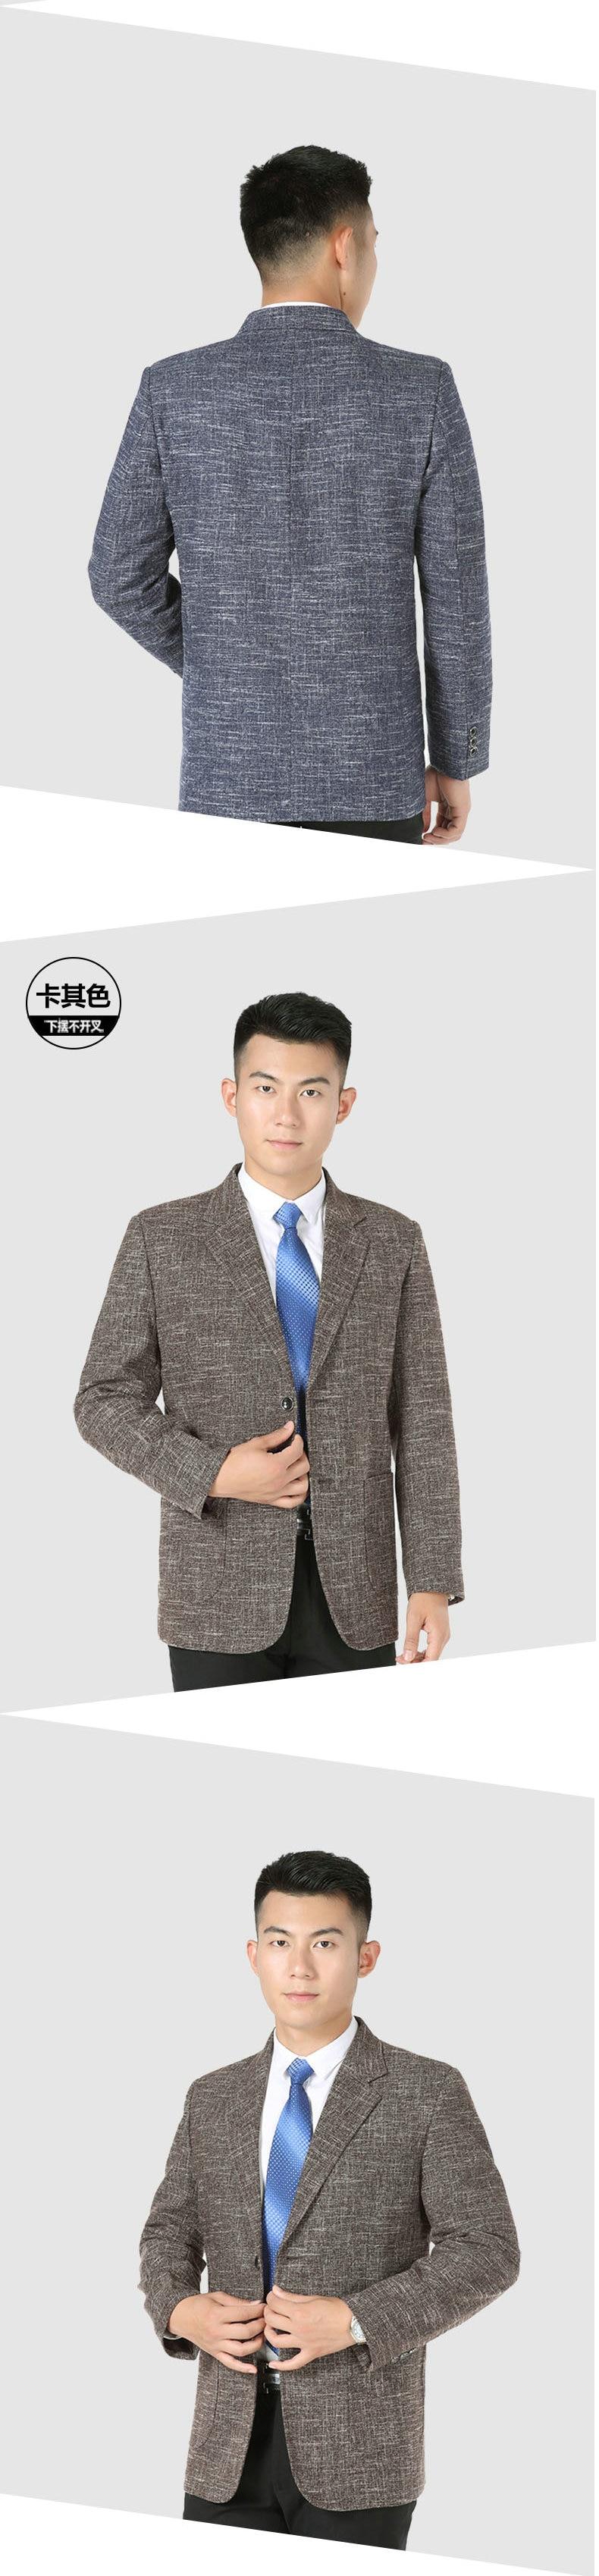 WAEOLSA Men Elegance Blazers Gray Red Khaki Suit Jackets Man Notched Collar Outfits Business Casual Blazer Male Office Suit Jacket Plus Size Wear (6)